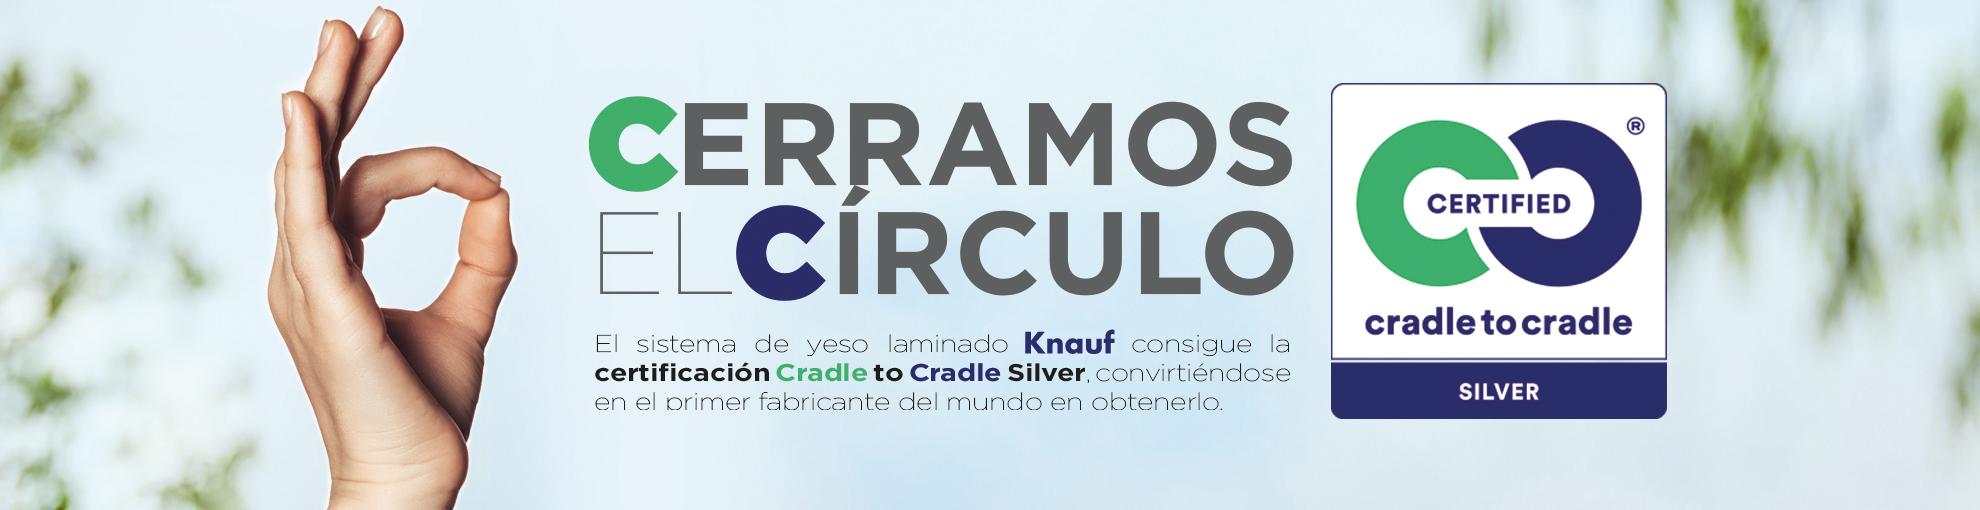 https://www.knauf.es/sites/default/files/revslider/image/web-landing-logo-azul.jpg